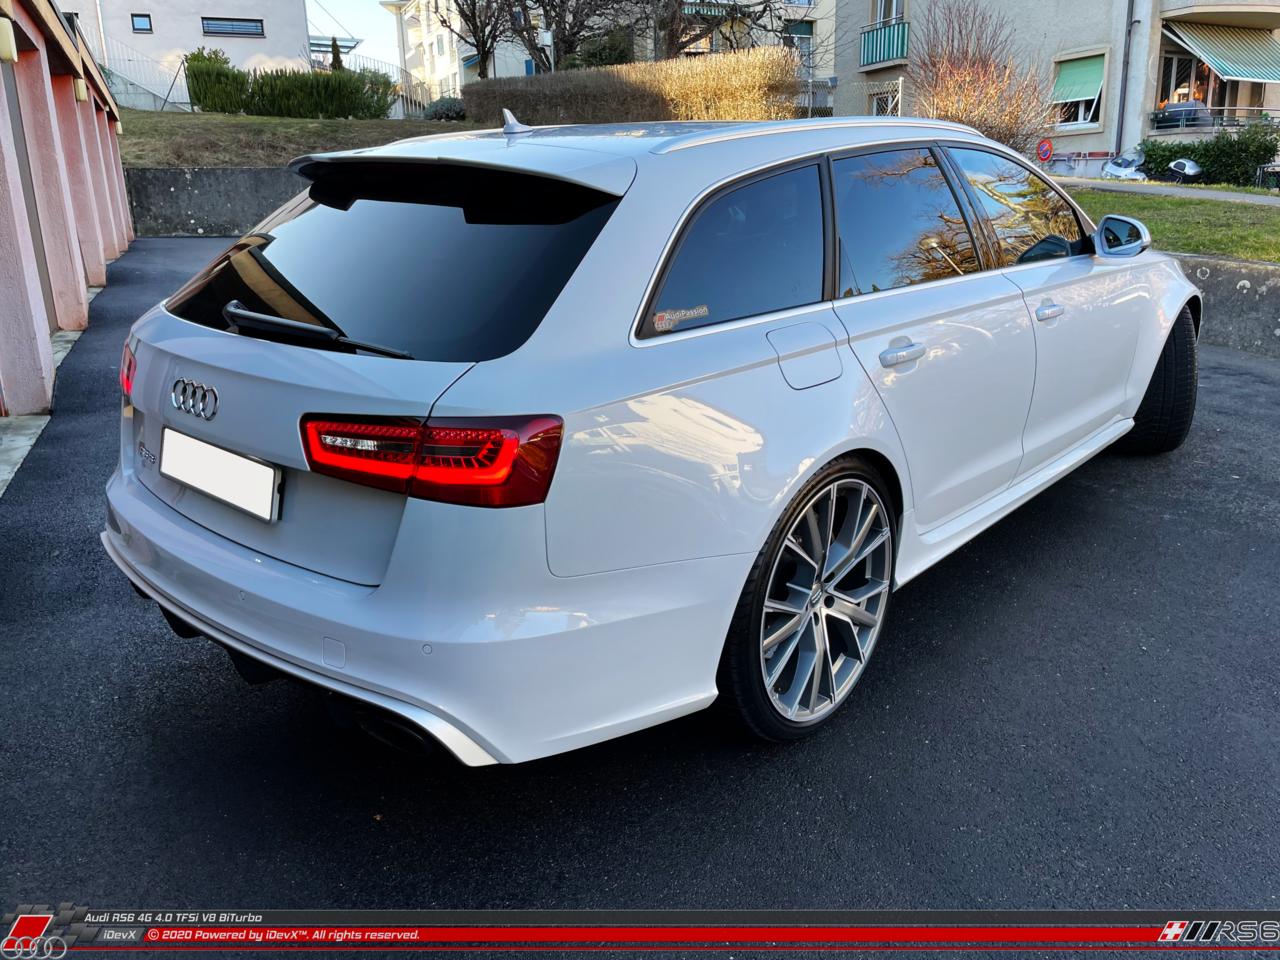 21.02.2021_Audi-RS6_iDevX_003.png